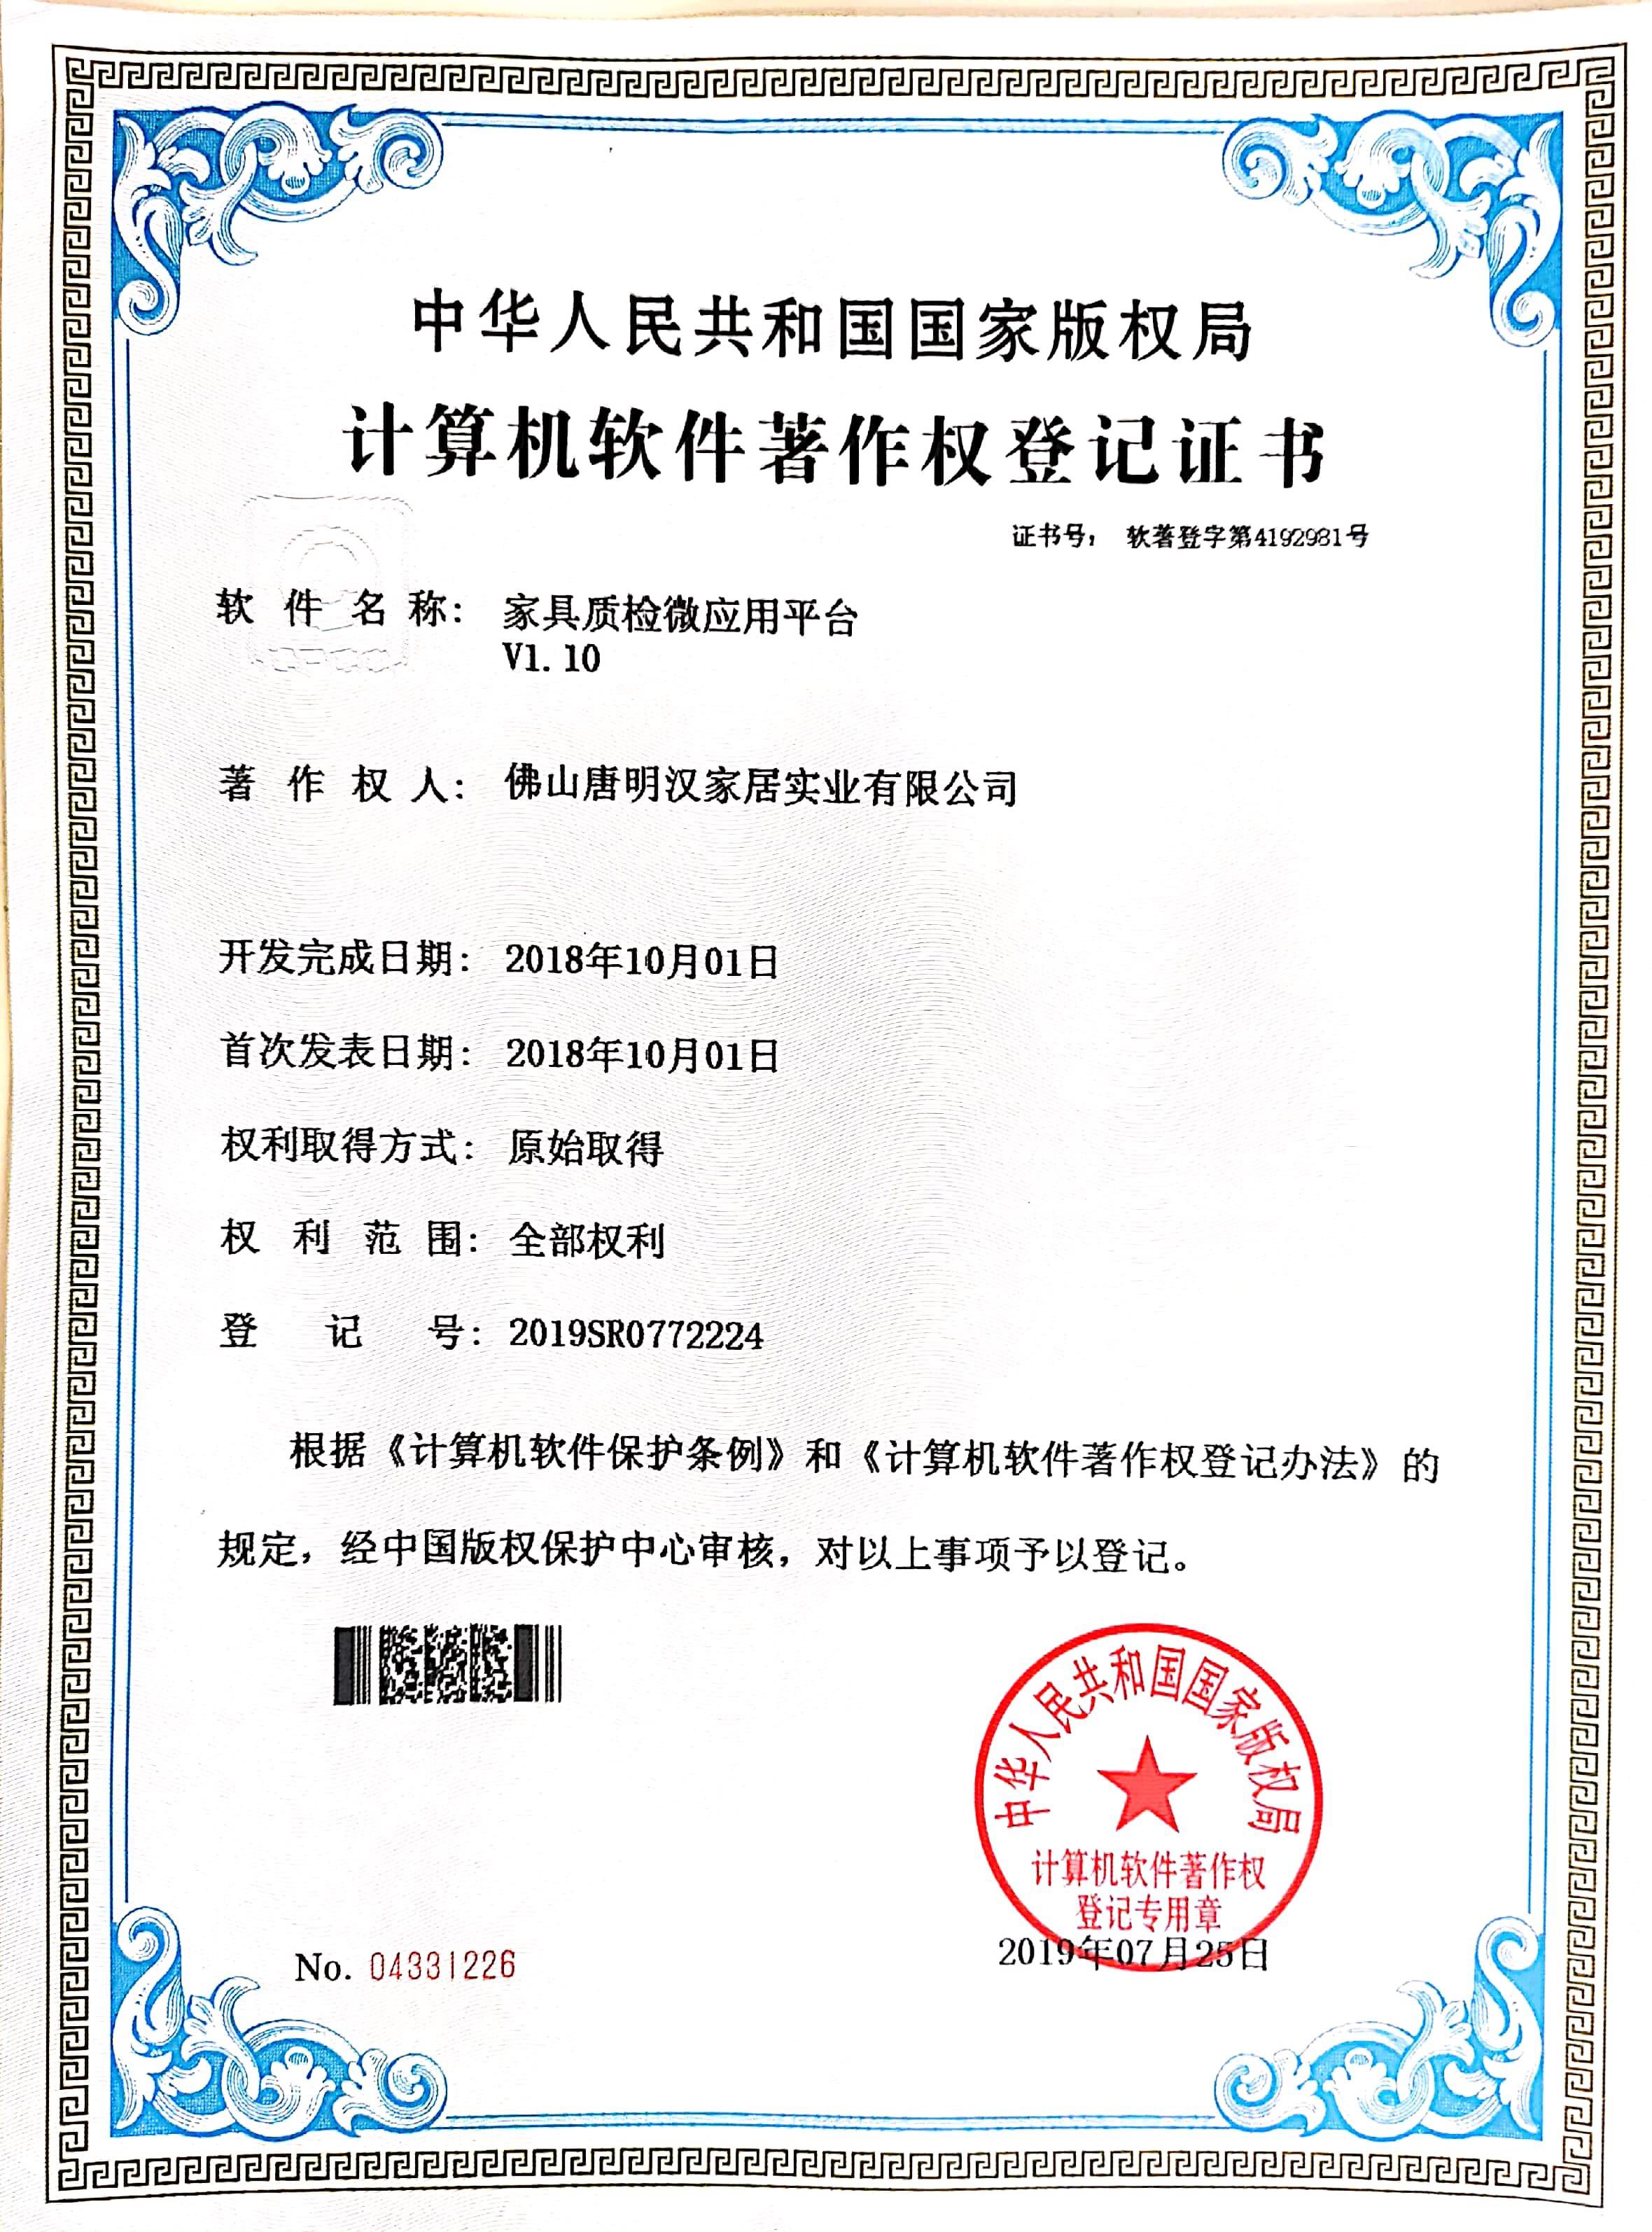 Furniture quality inspection application platform v1.10 patent certificate